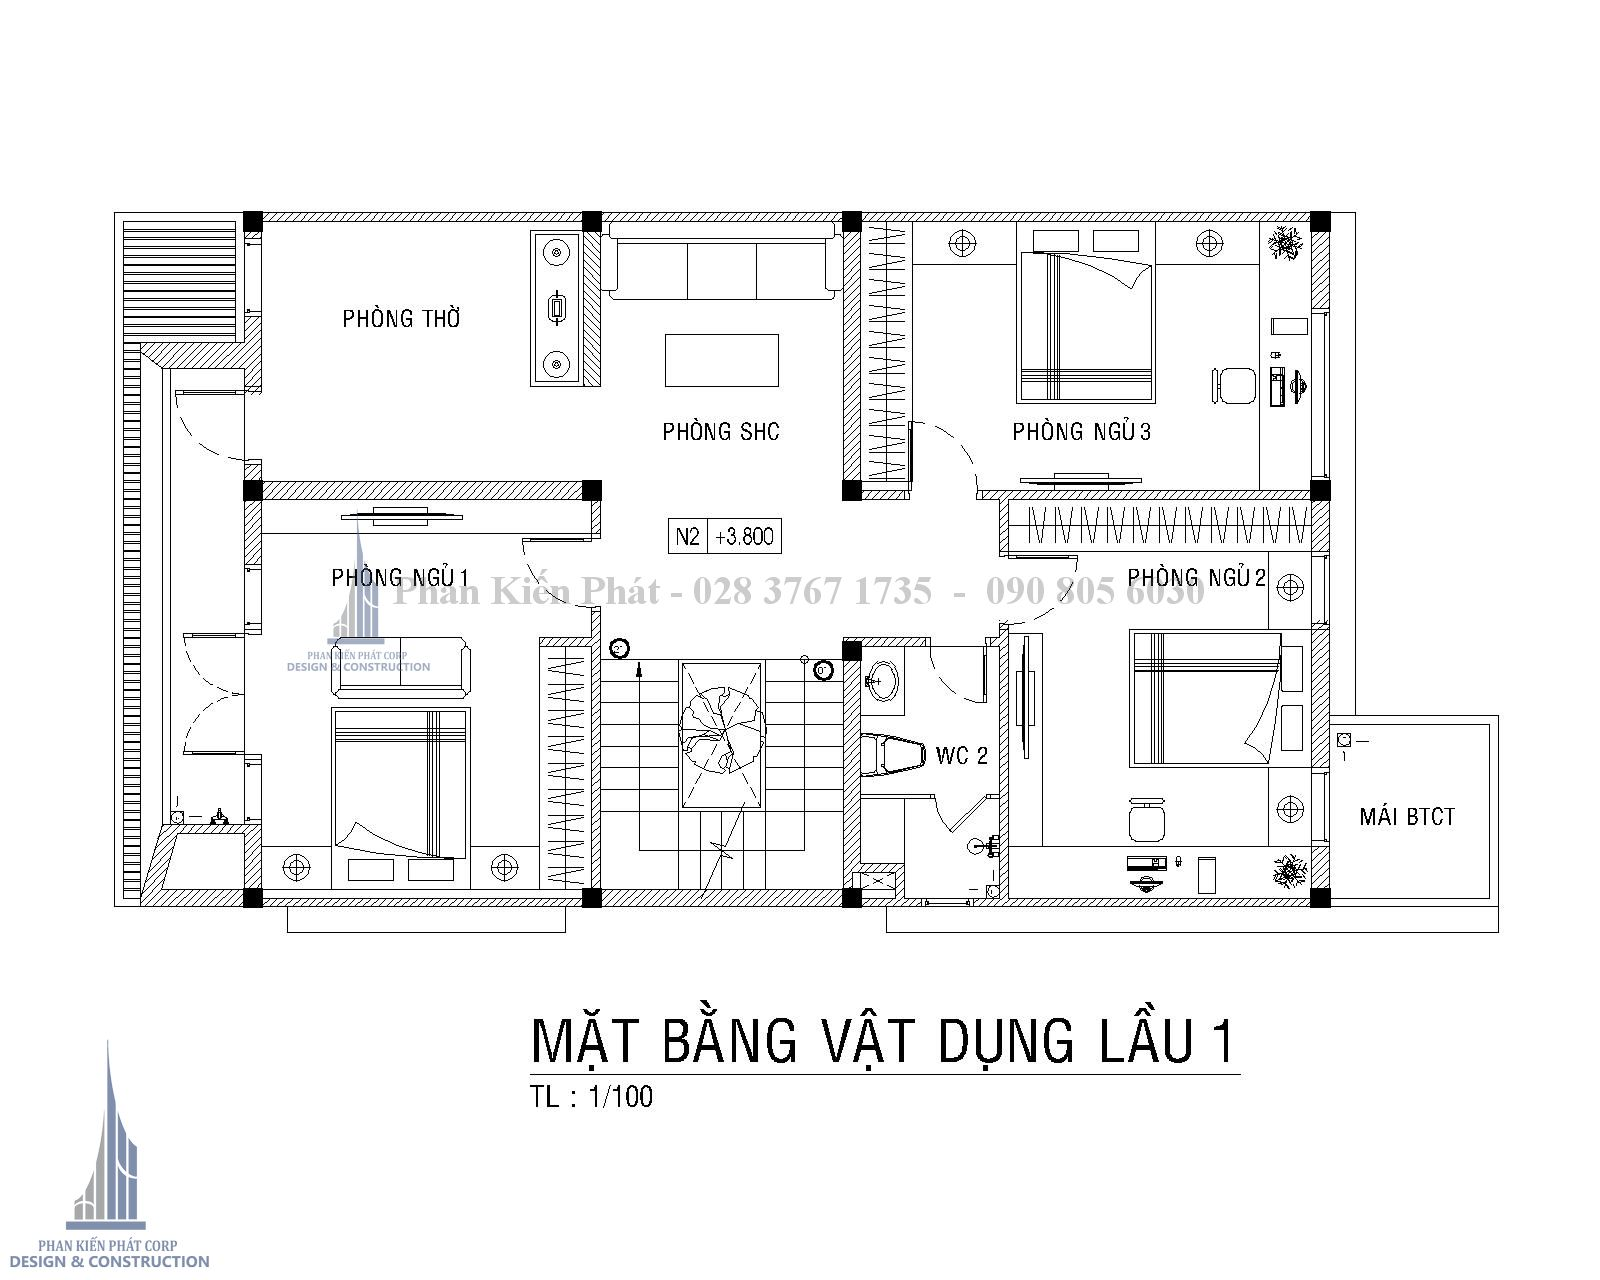 Mat Bang Lau 1 Biet Thu Pho Hien Dai Binh Phuoc Tkxn